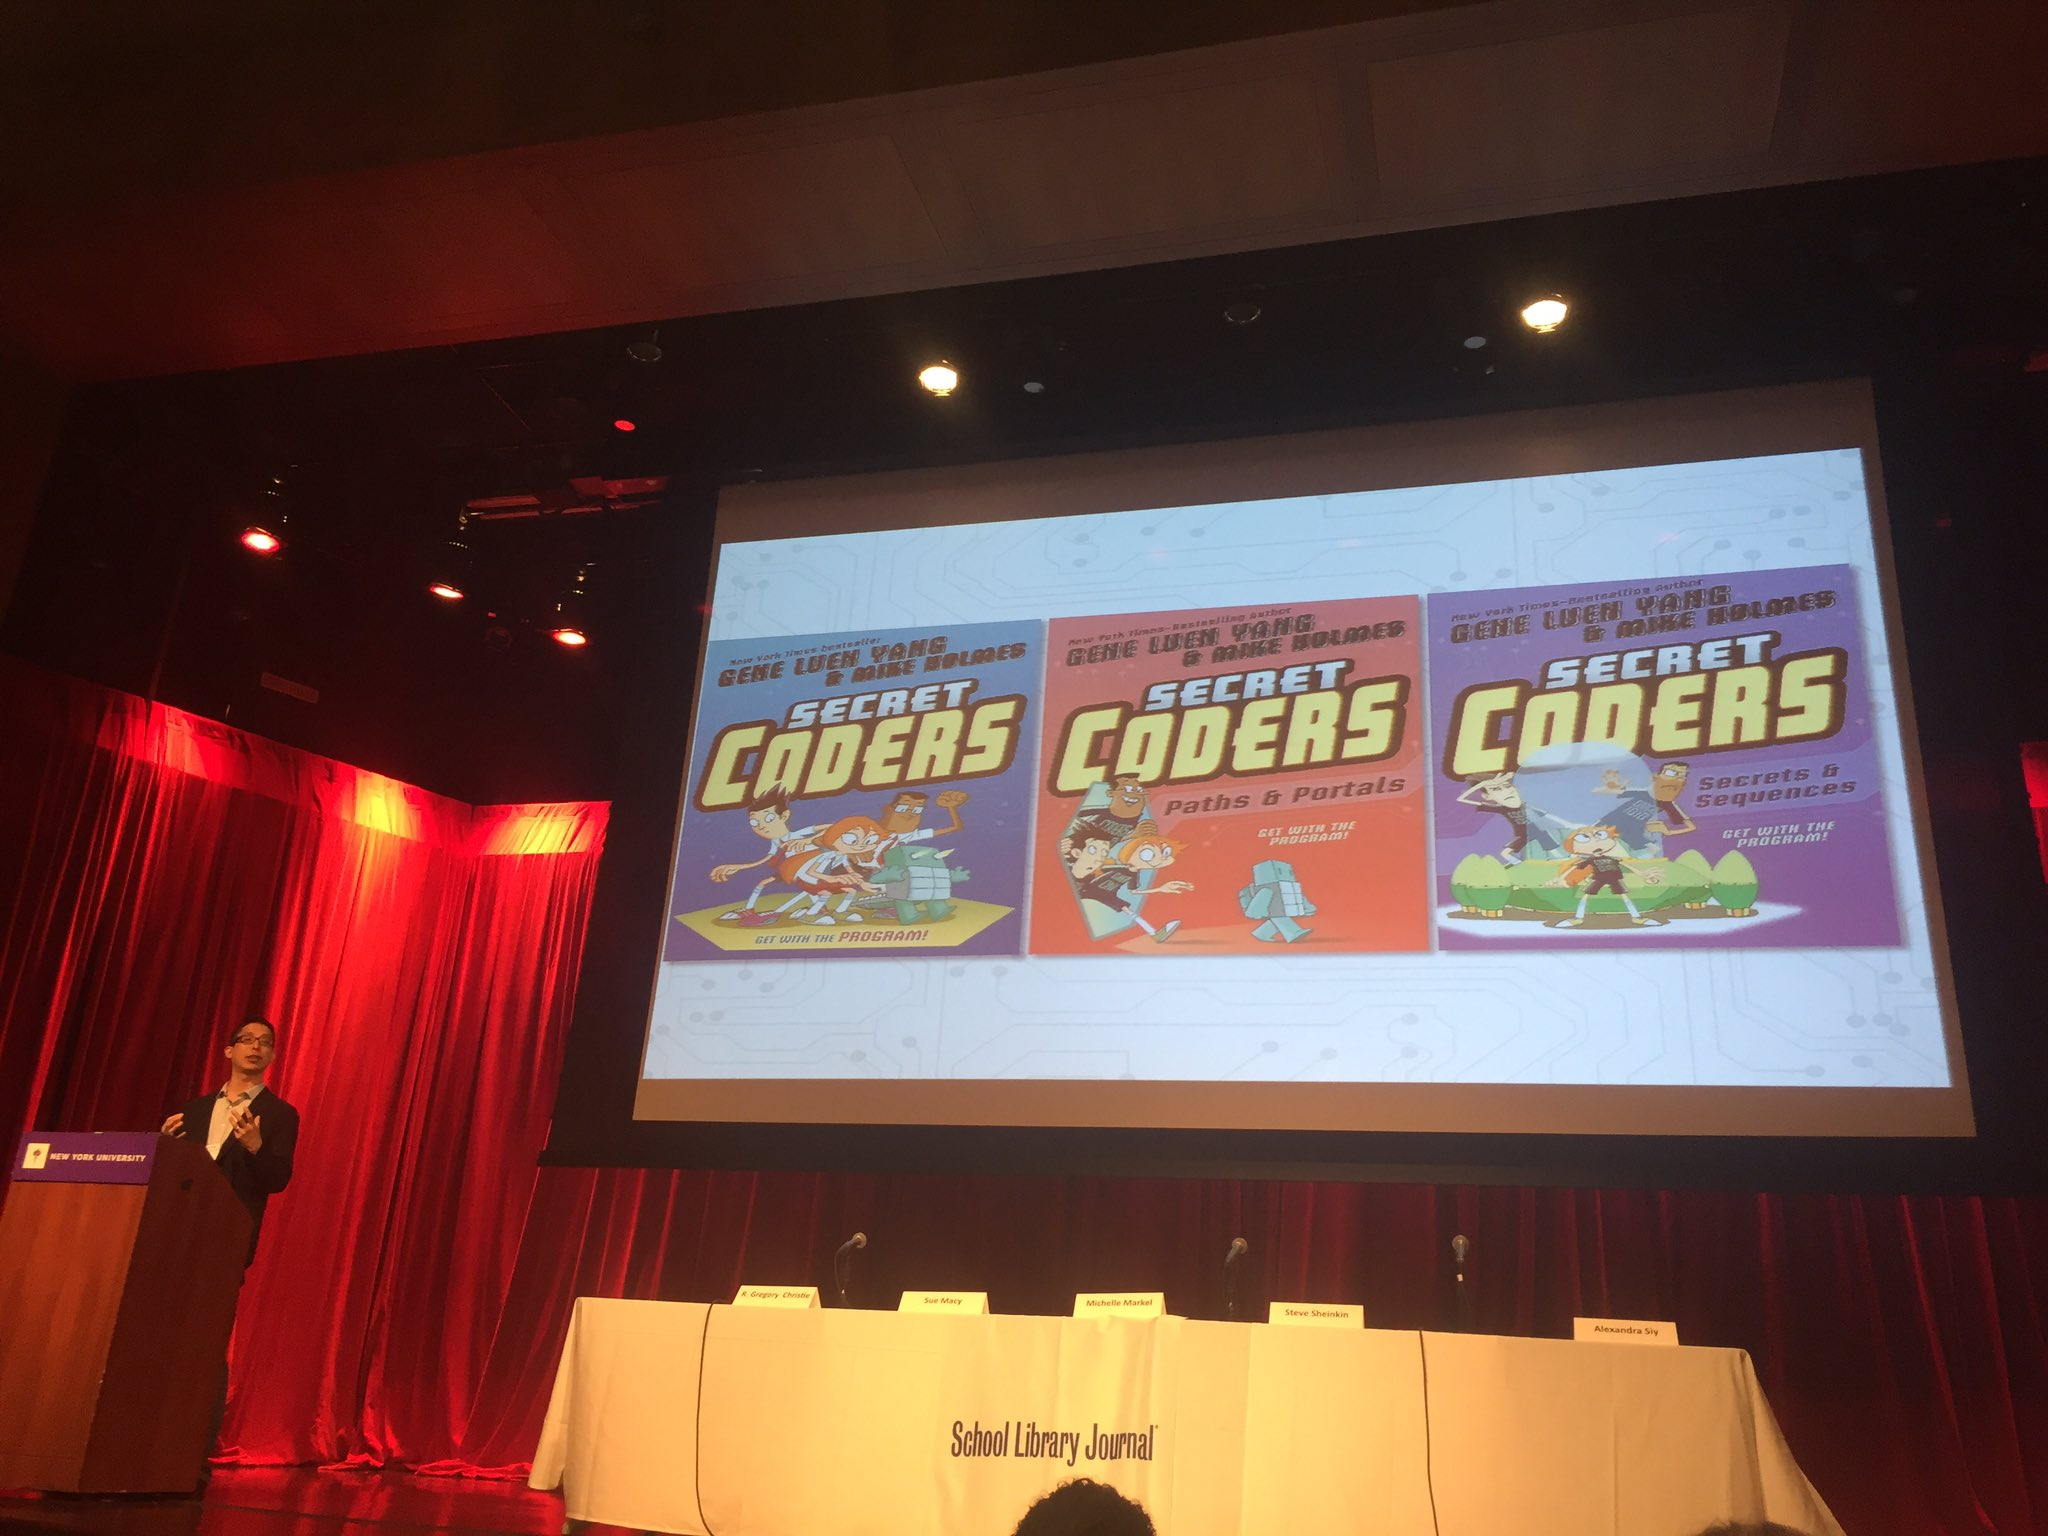 Love the #secretcoders by @geneluenyang! #booklove @bristowllc #SLJDOD17 @sljournal https://t.co/vdg5OXO2ru